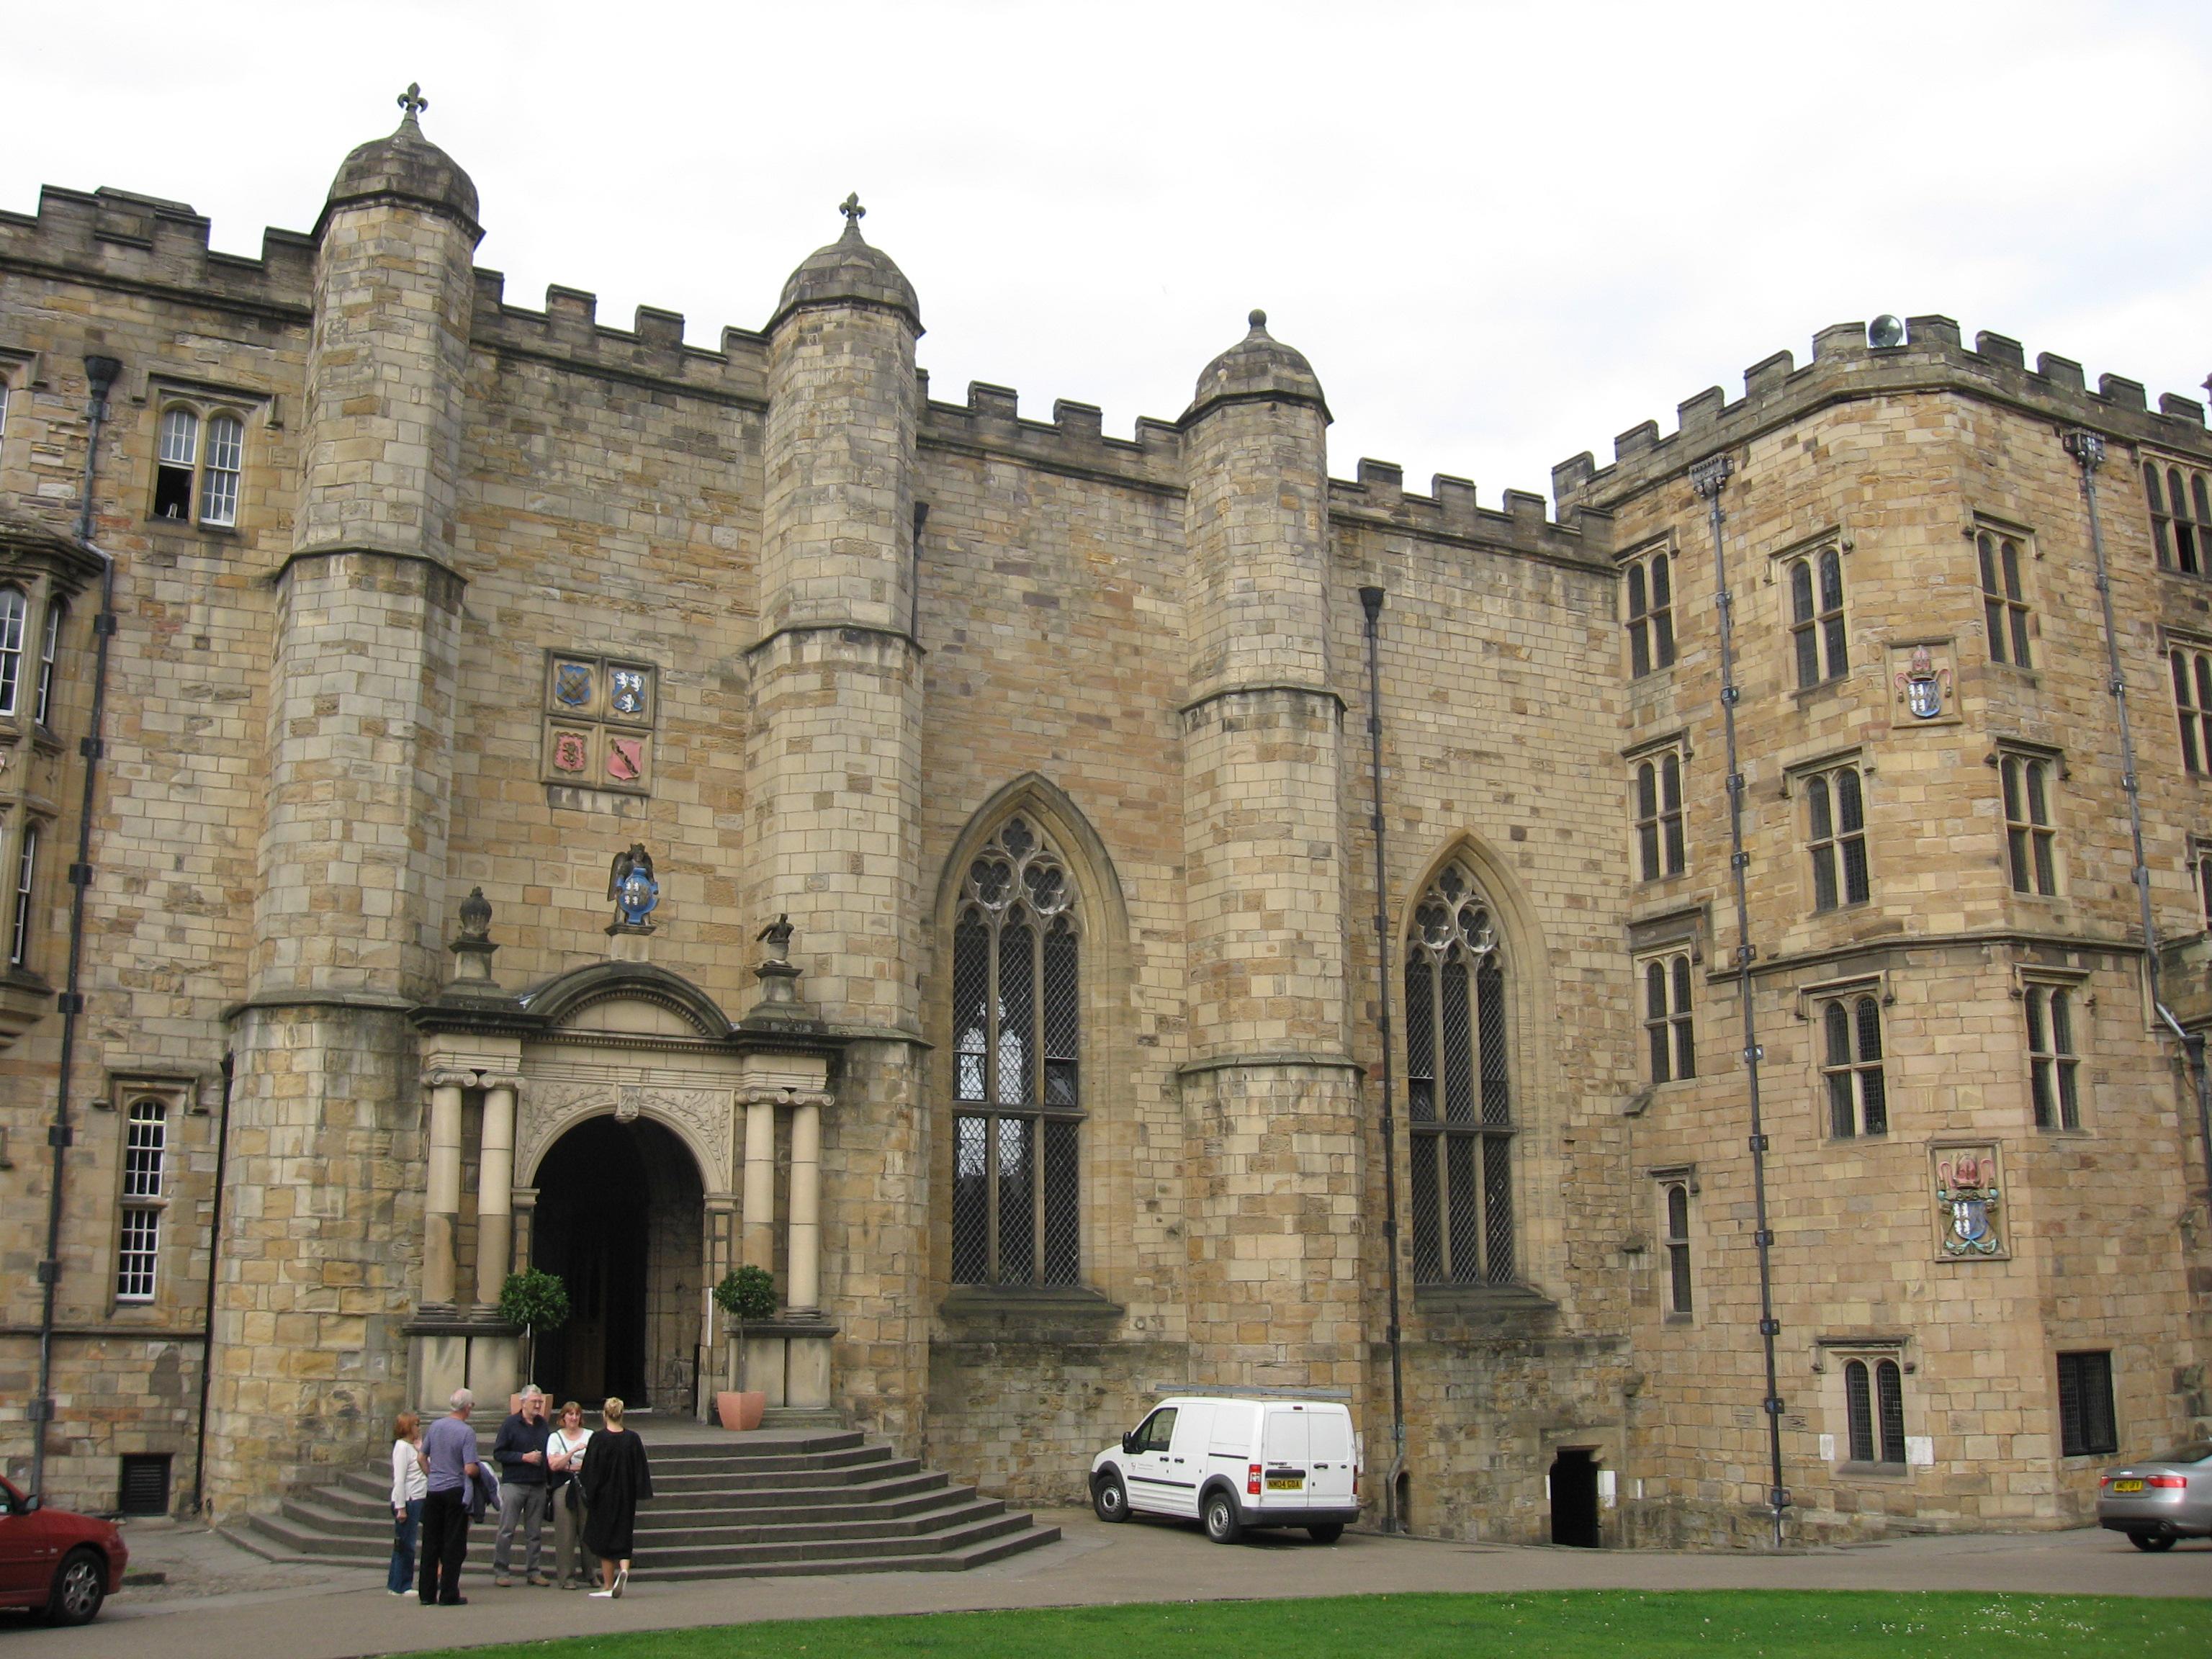 http://upload.wikimedia.org/wikipedia/commons/0/0d/Durham_Castle_Entrance.JPG